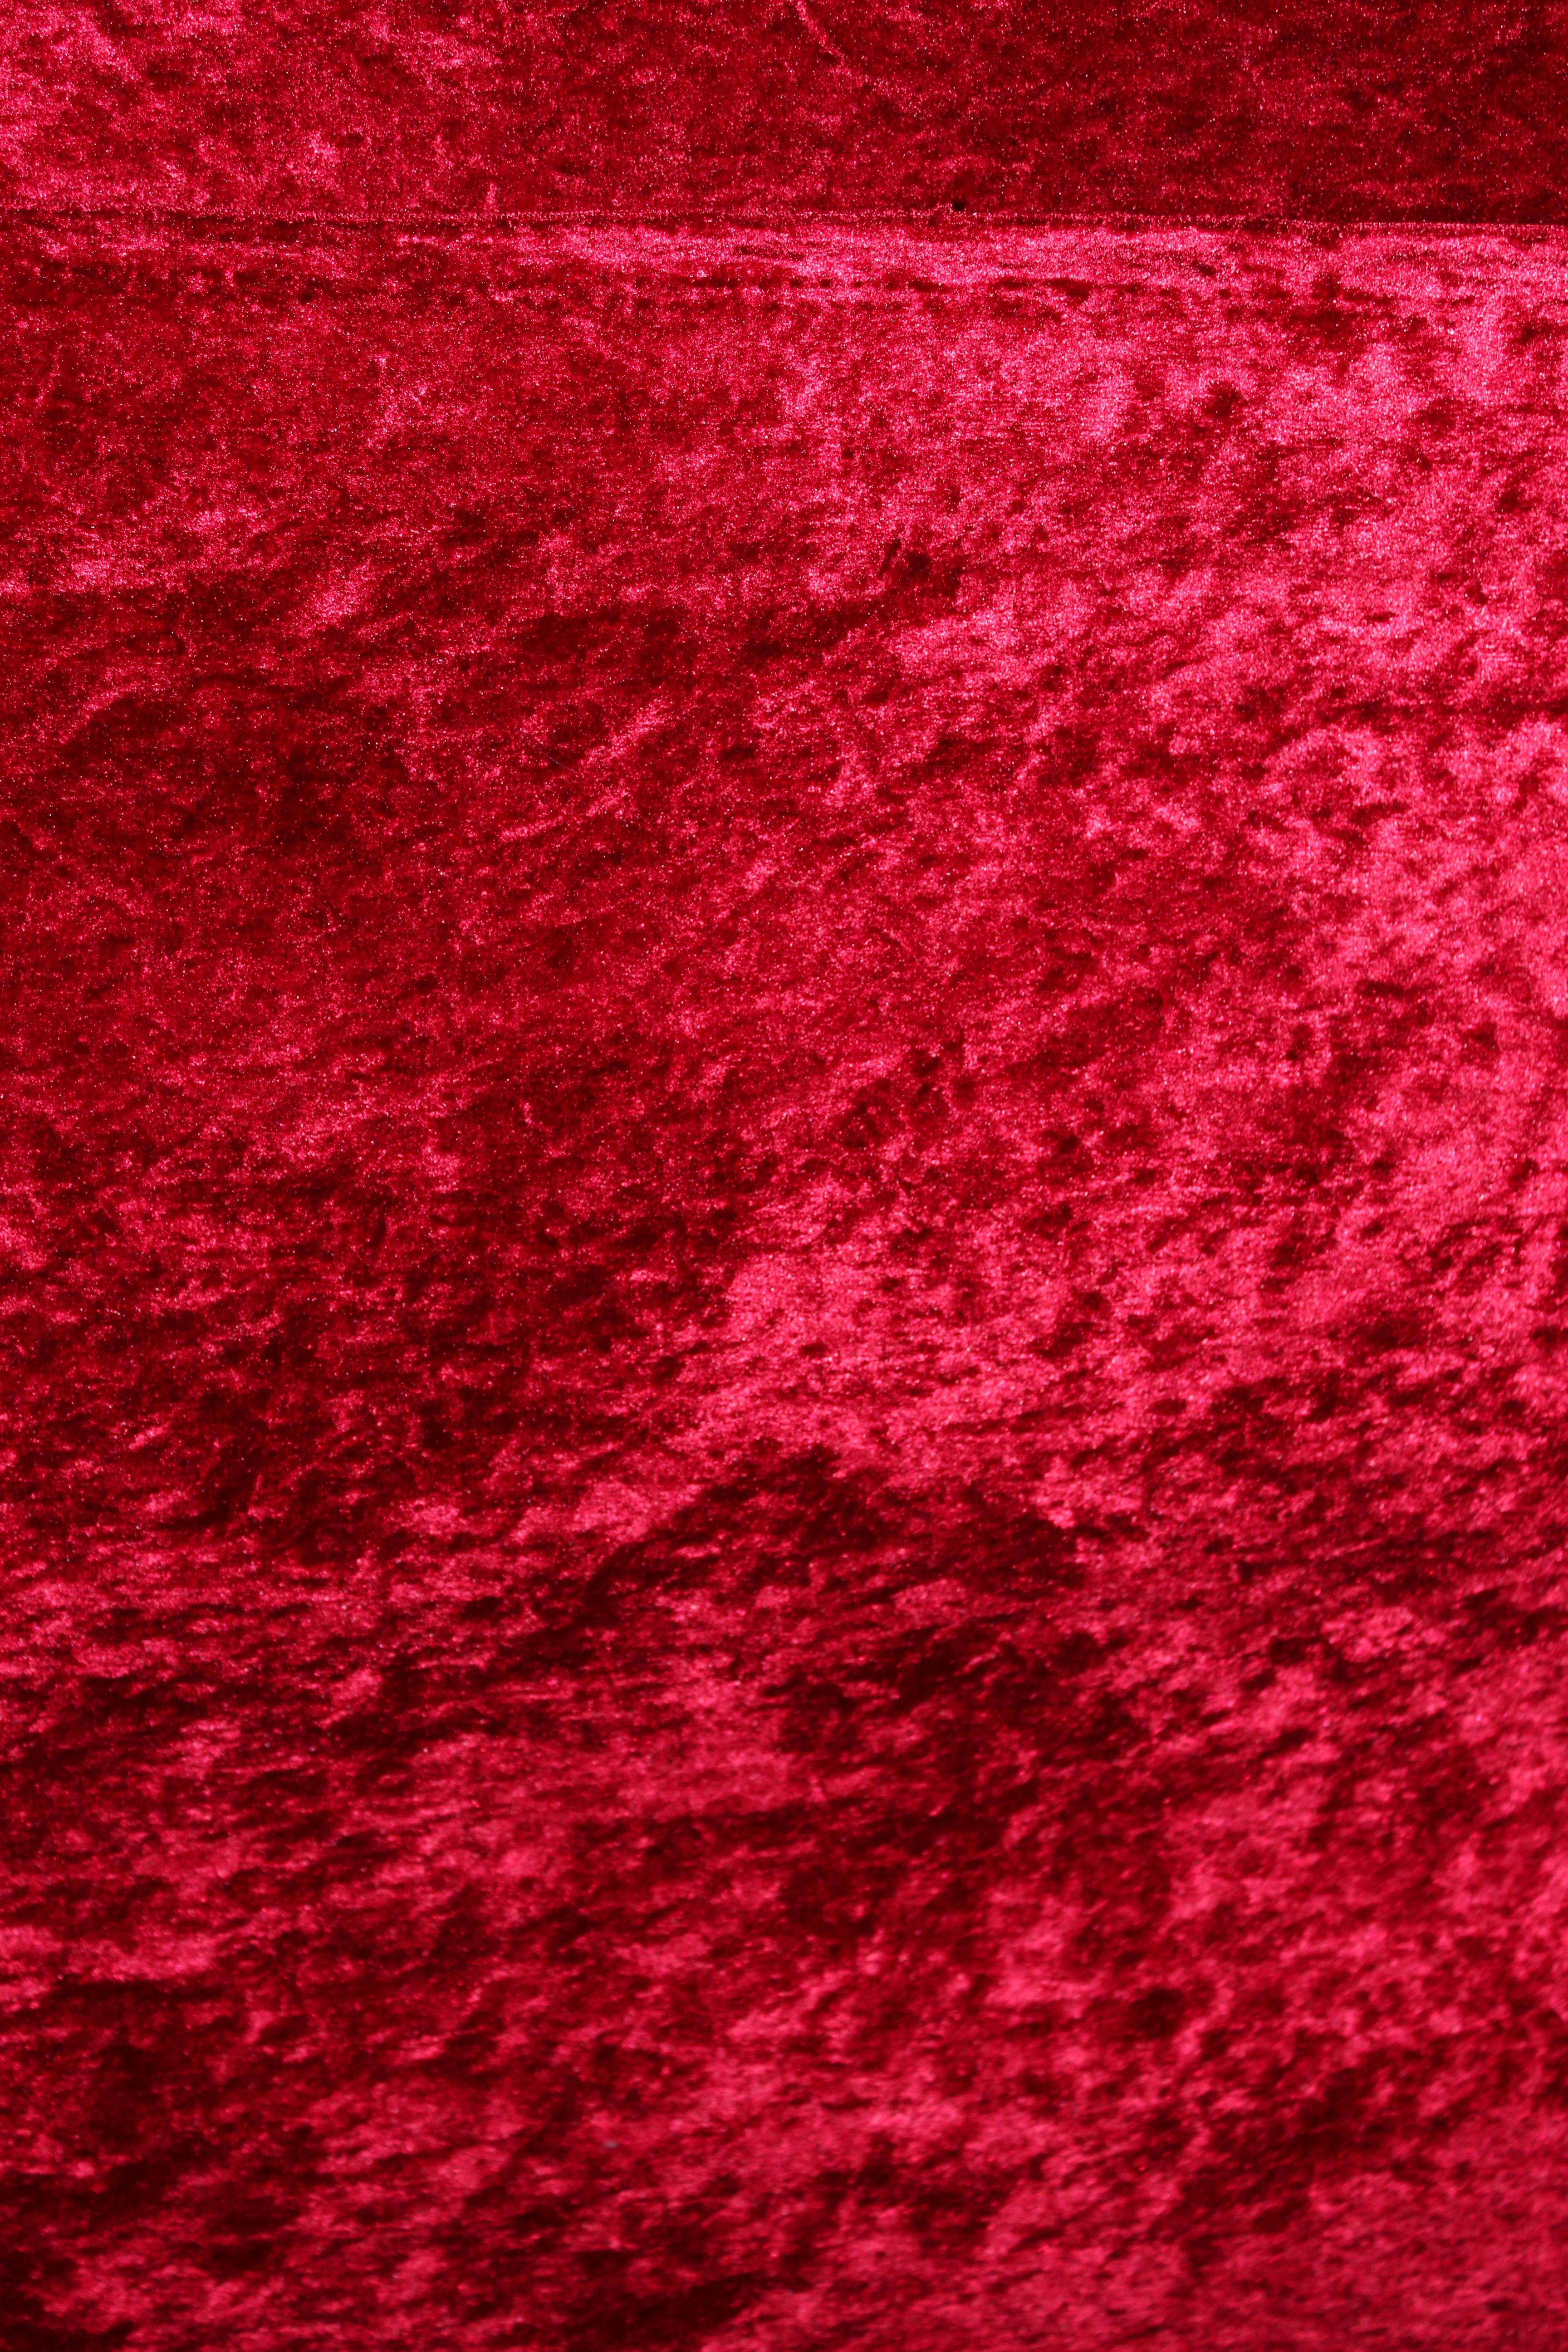 Crushed Velvet Texture By Dragonat0r